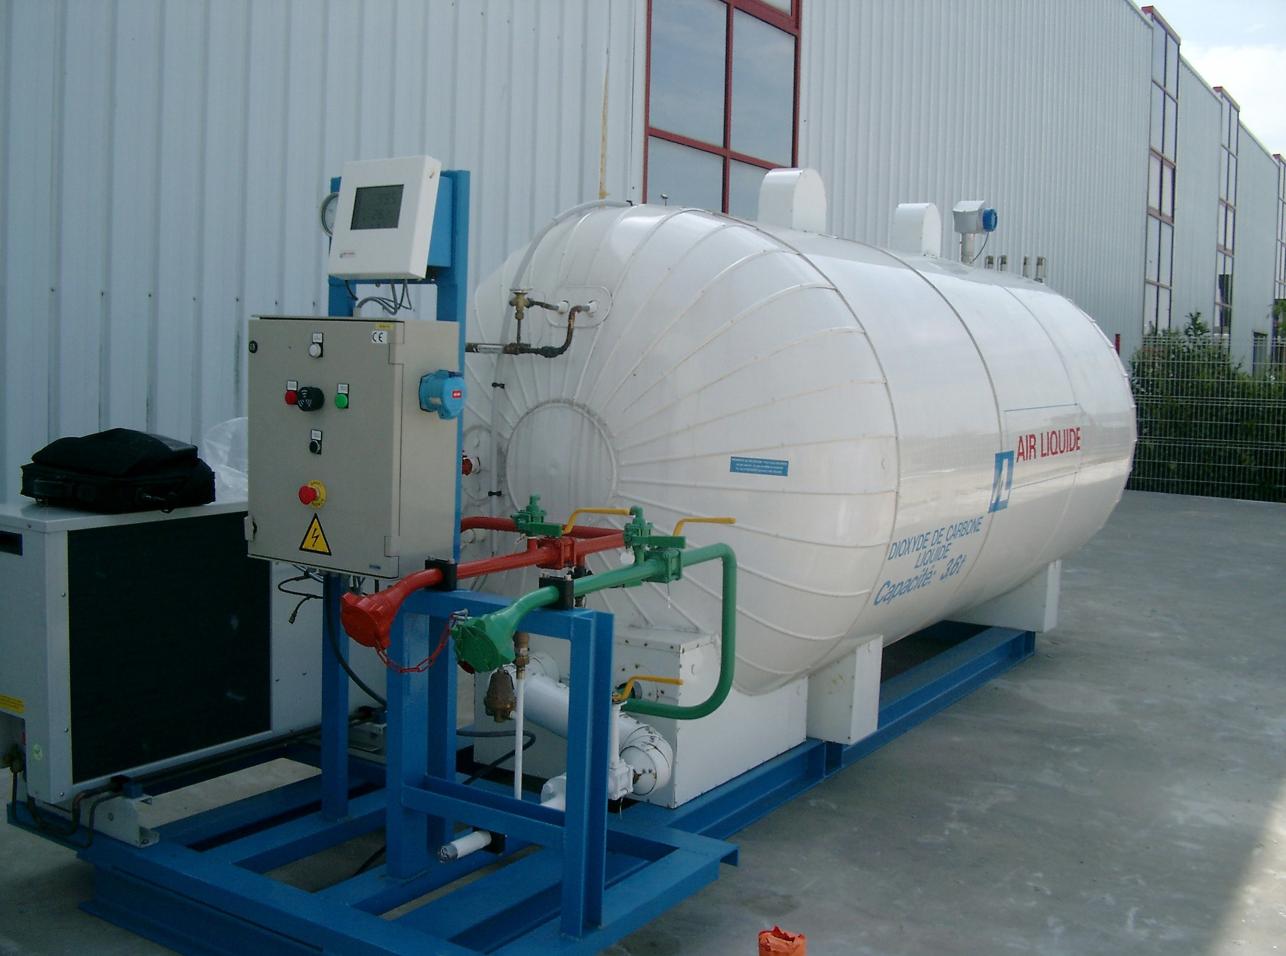 Level measurement on Carbon Dioxide tanks at AIR LIQUIDE